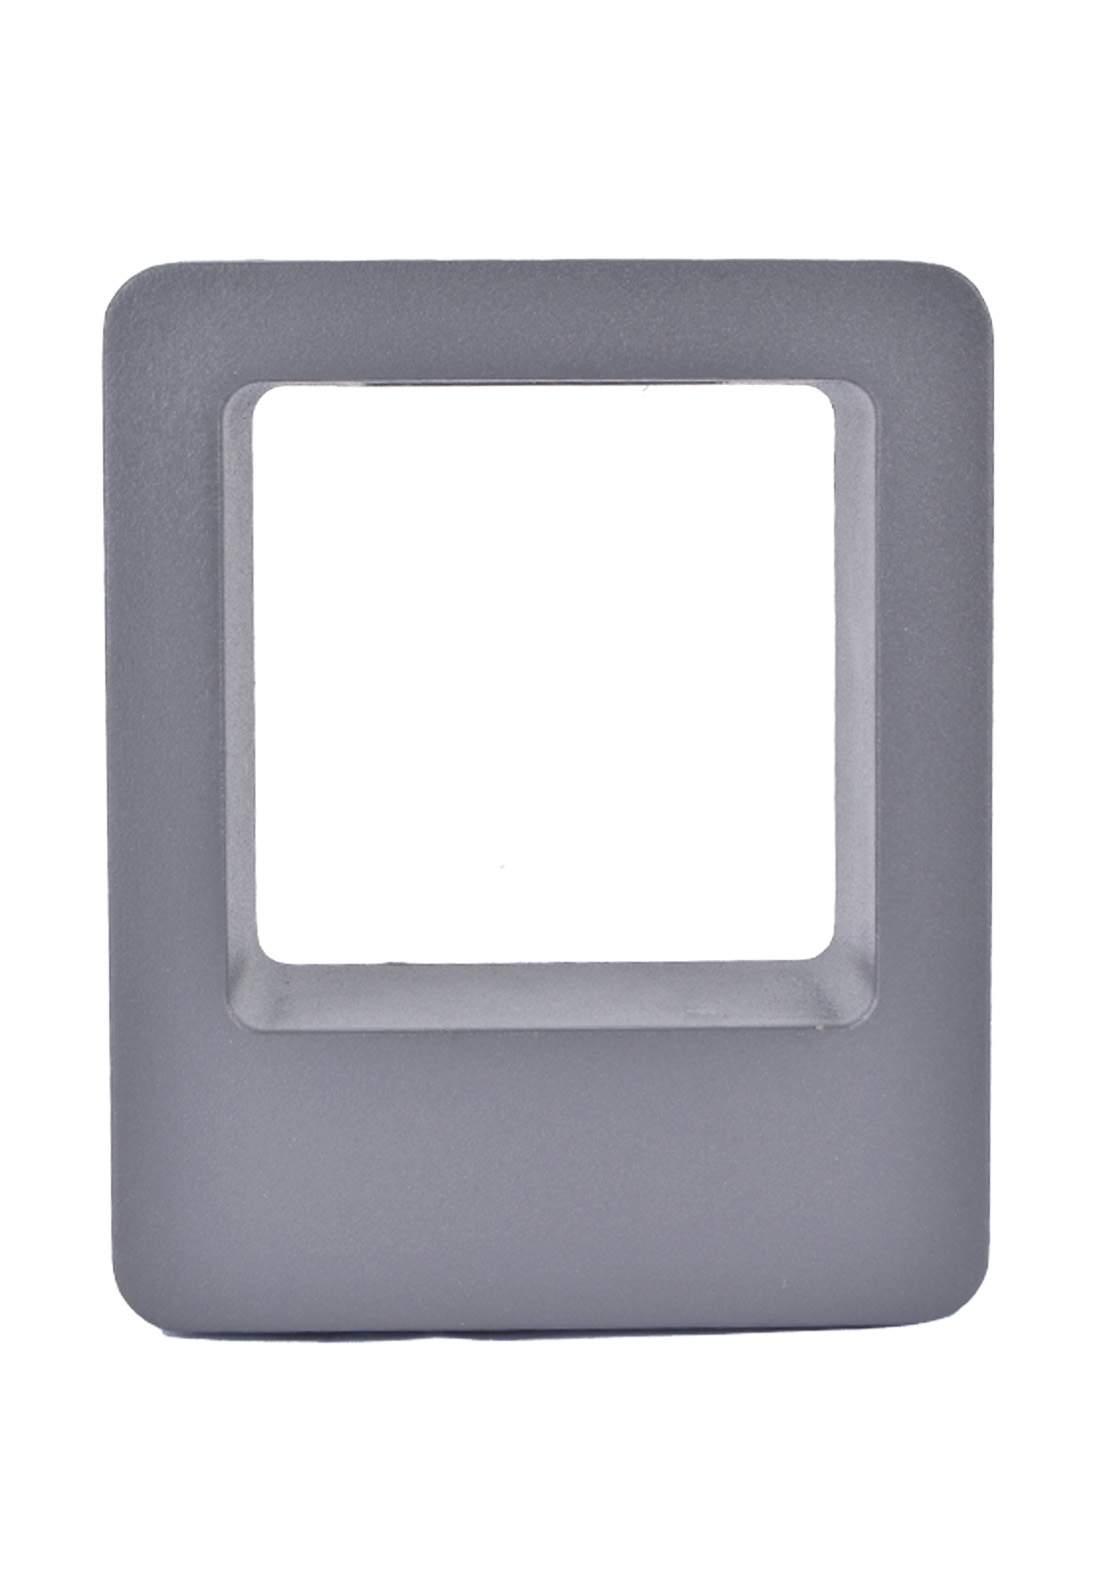 Luceco LEXD5SUDG3-01 Square Led Wall Light 5.6 Watt مصباح ليد خارجي